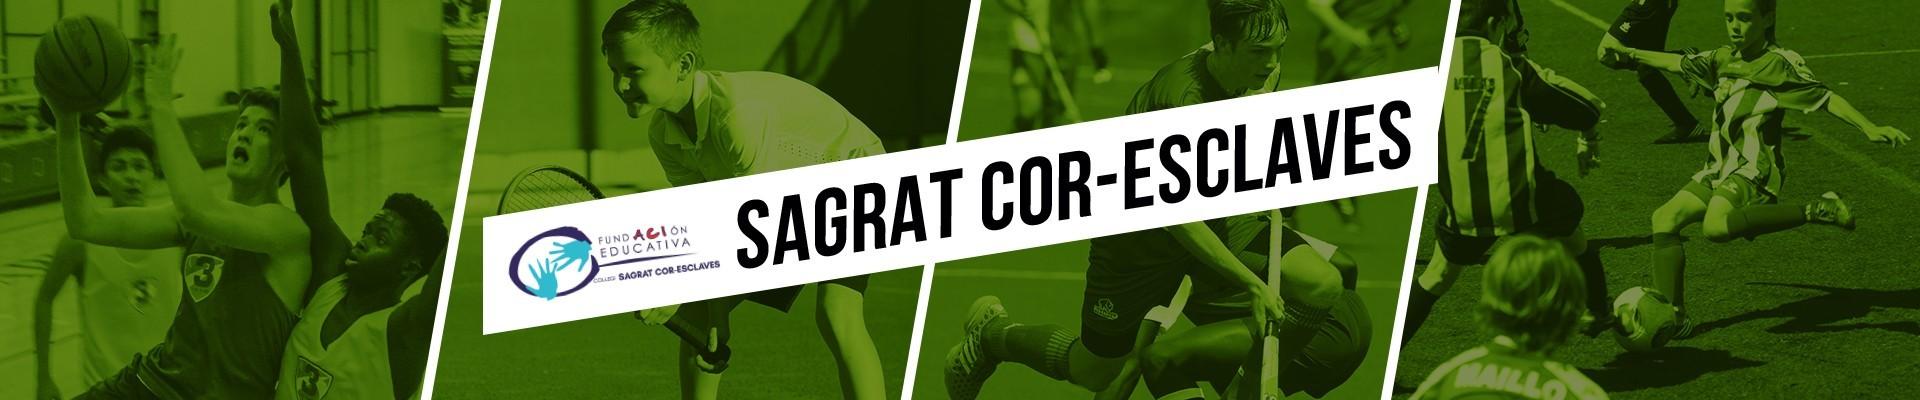 SAGRAT COR-ESCLAVES